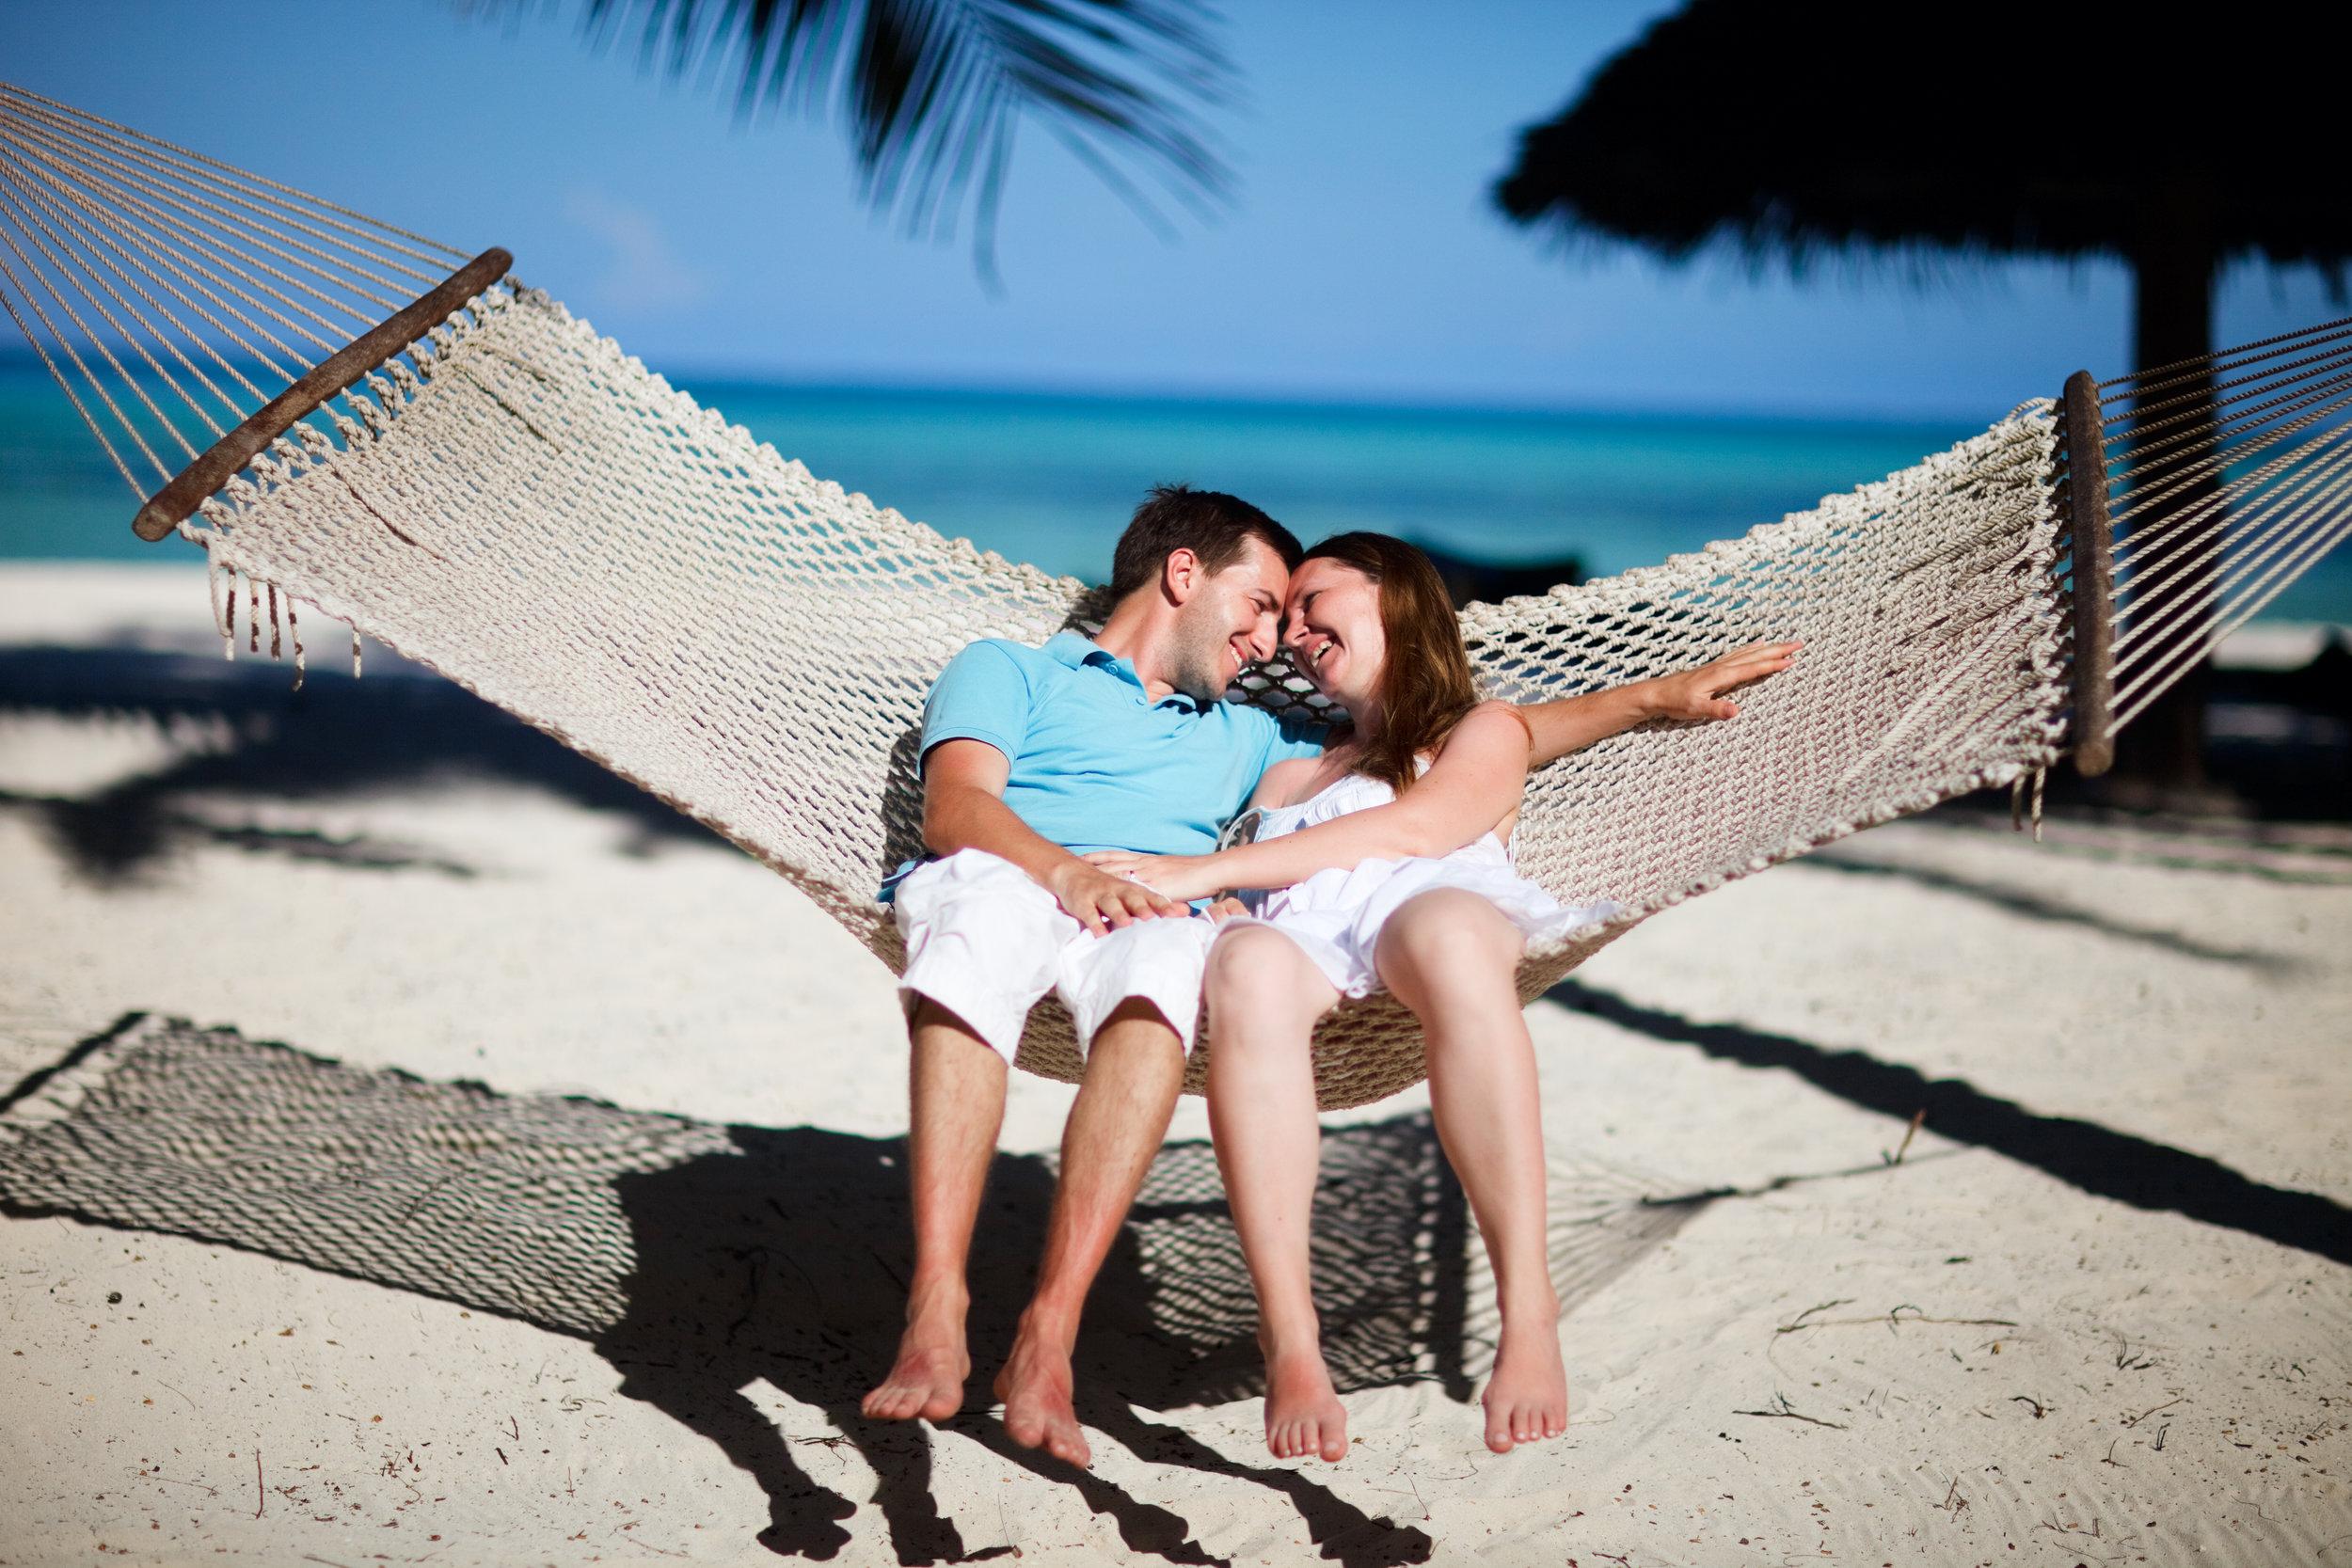 - Beach Holidays